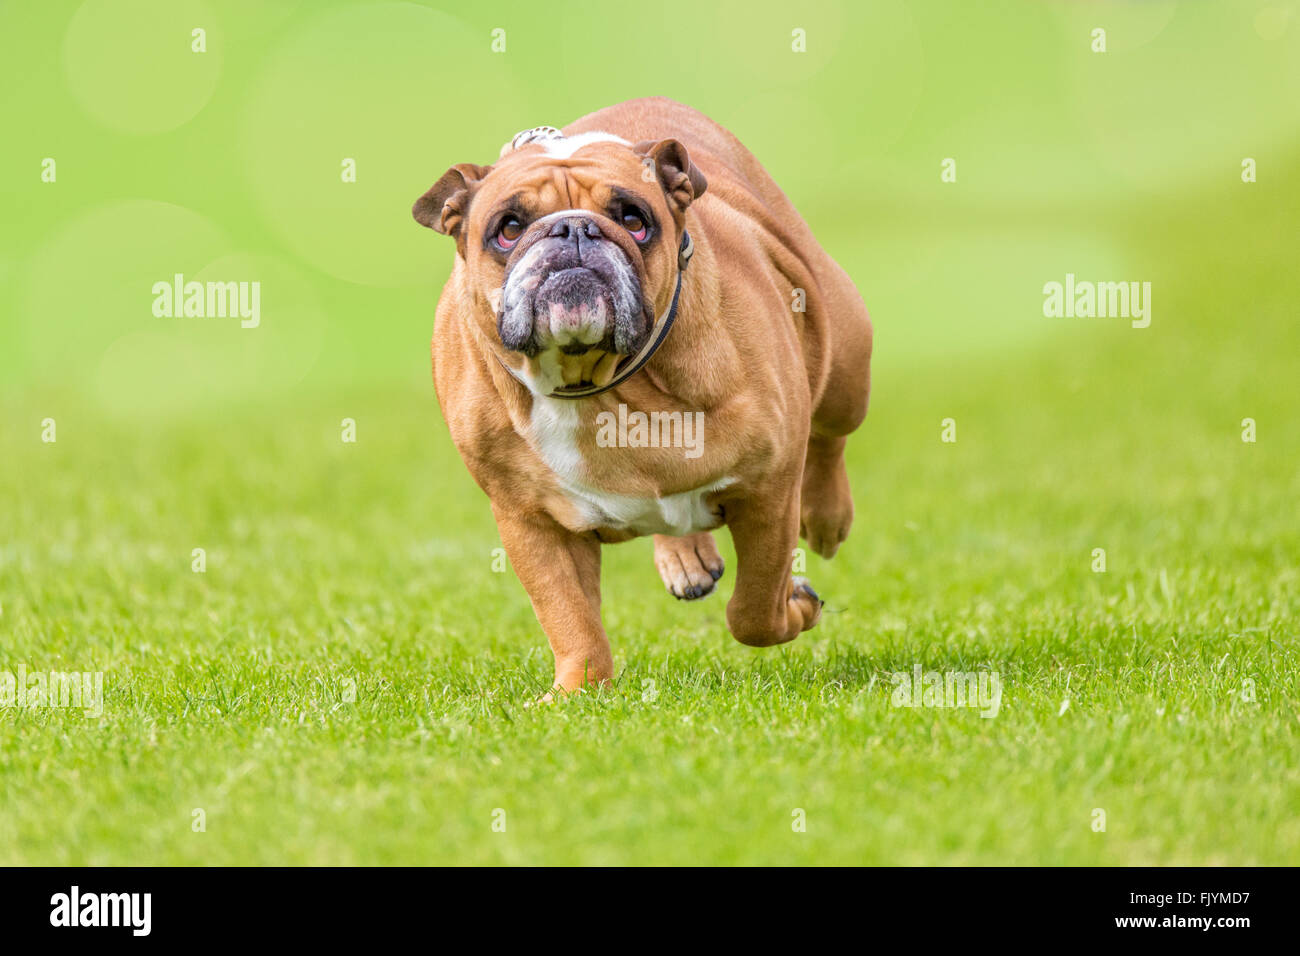 Grumpy looking overweight bulldog runs over the green - Stock Image